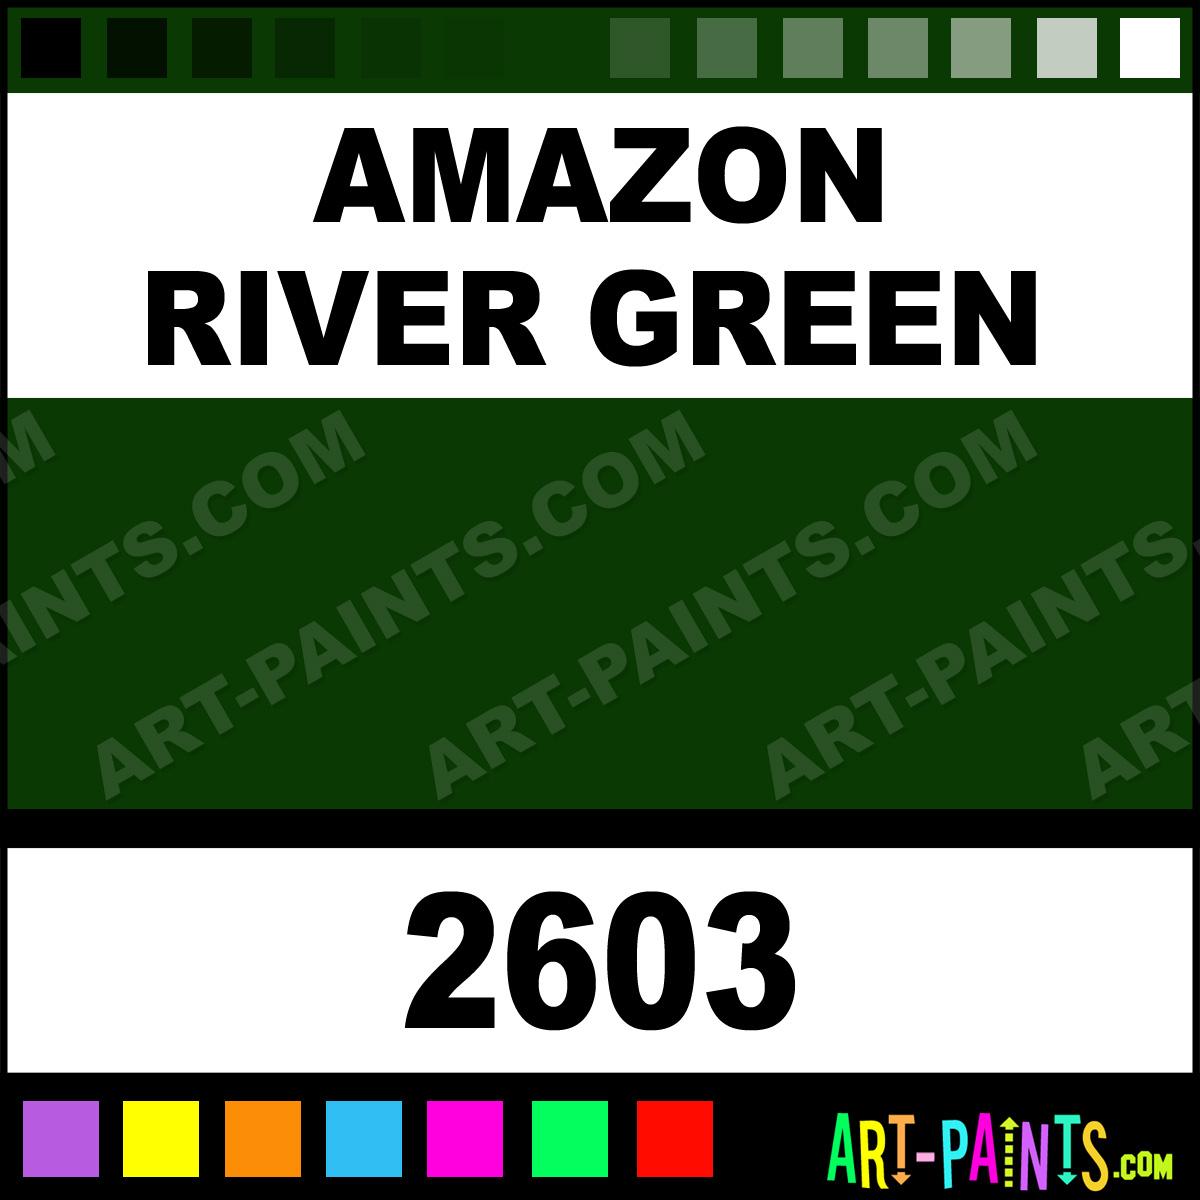 amazon river green h2o latex spray paints 2603 amazon. Black Bedroom Furniture Sets. Home Design Ideas